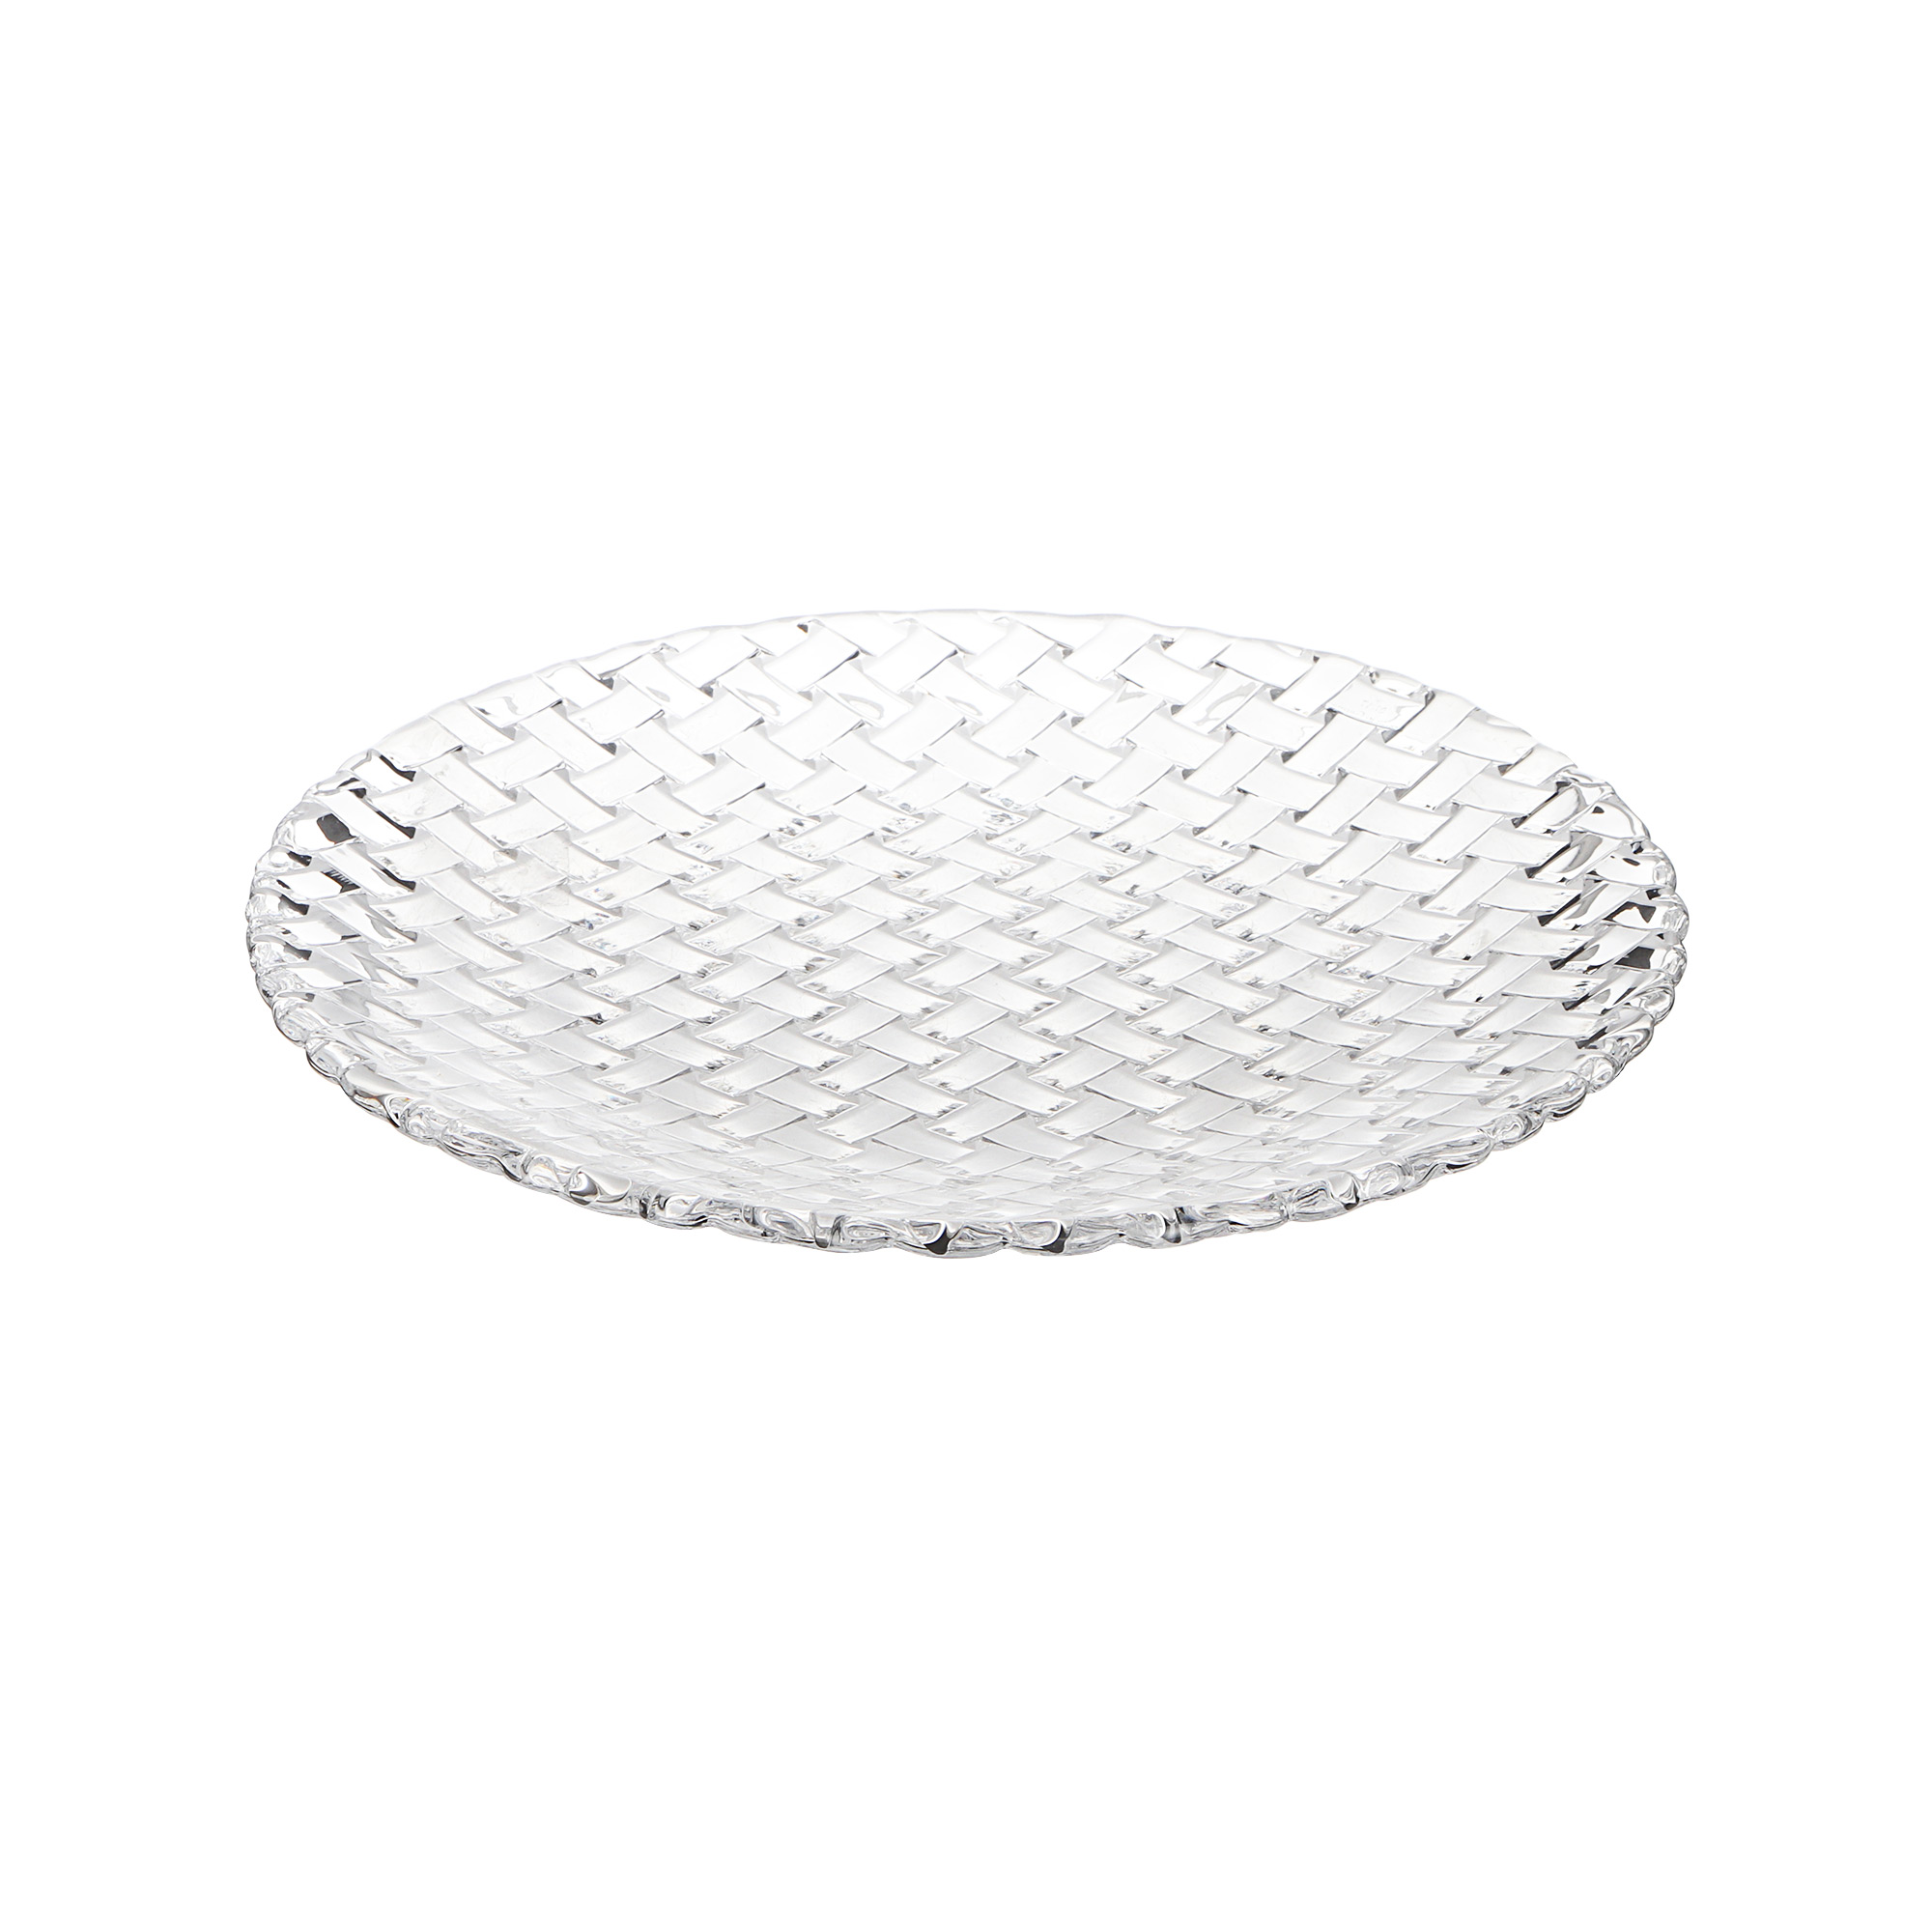 Набор тарелок Nachtmann Bossa Nova 23 см 2 шт набор тарелок nachtmann bossa nova 32 см 2 шт